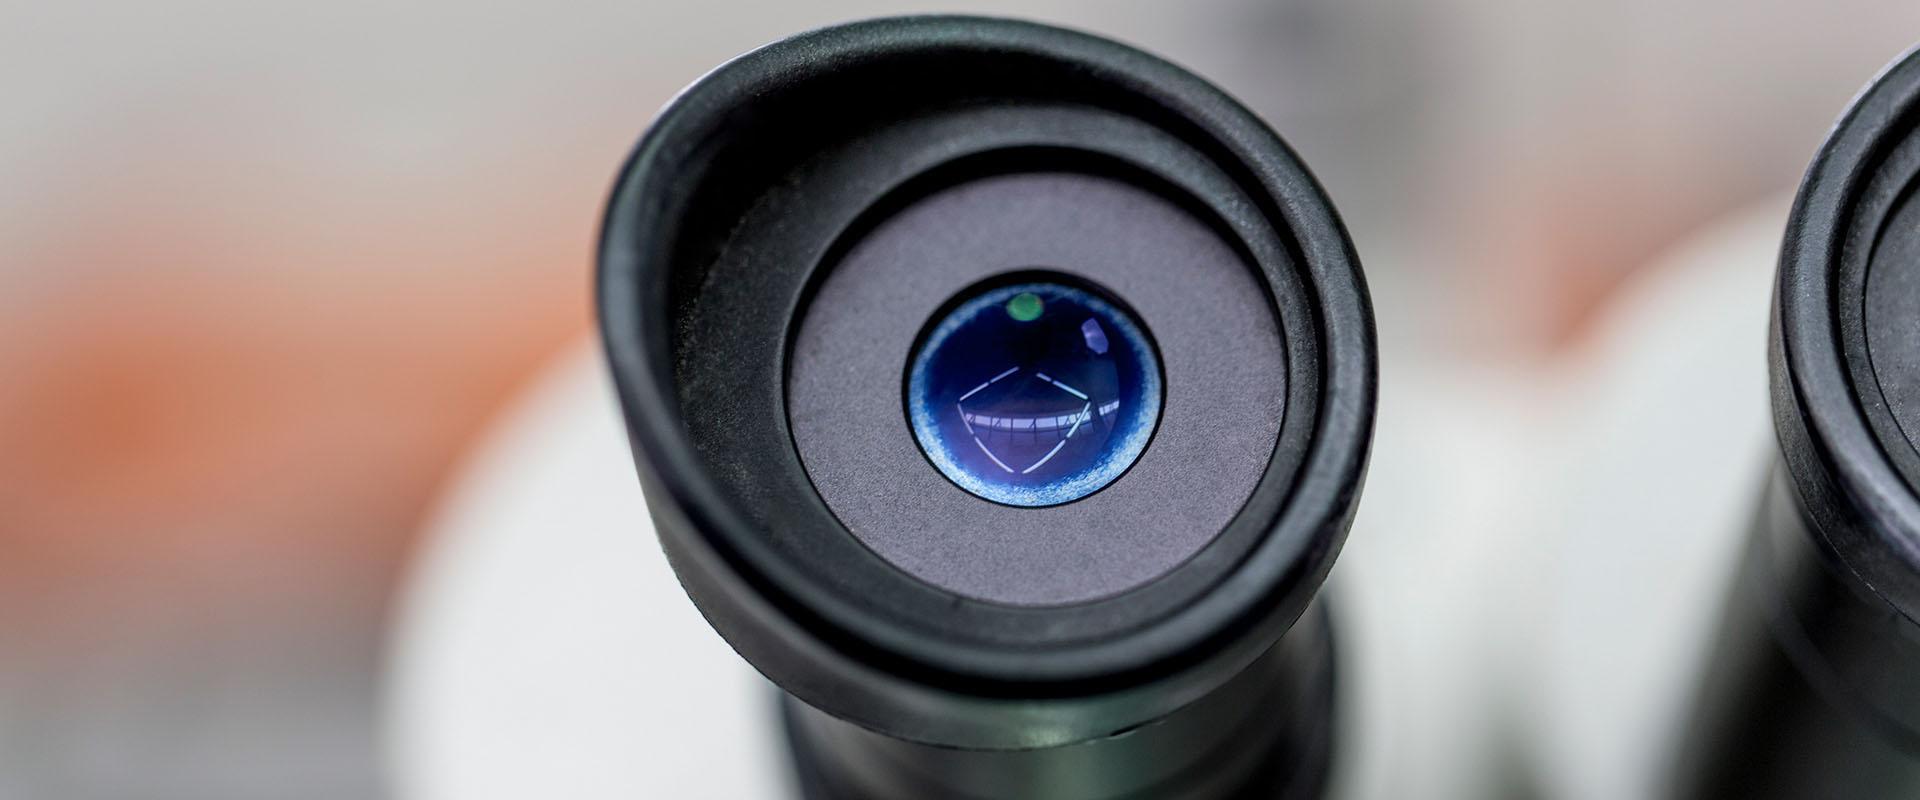 Startseite_Mikroskop_1920x800